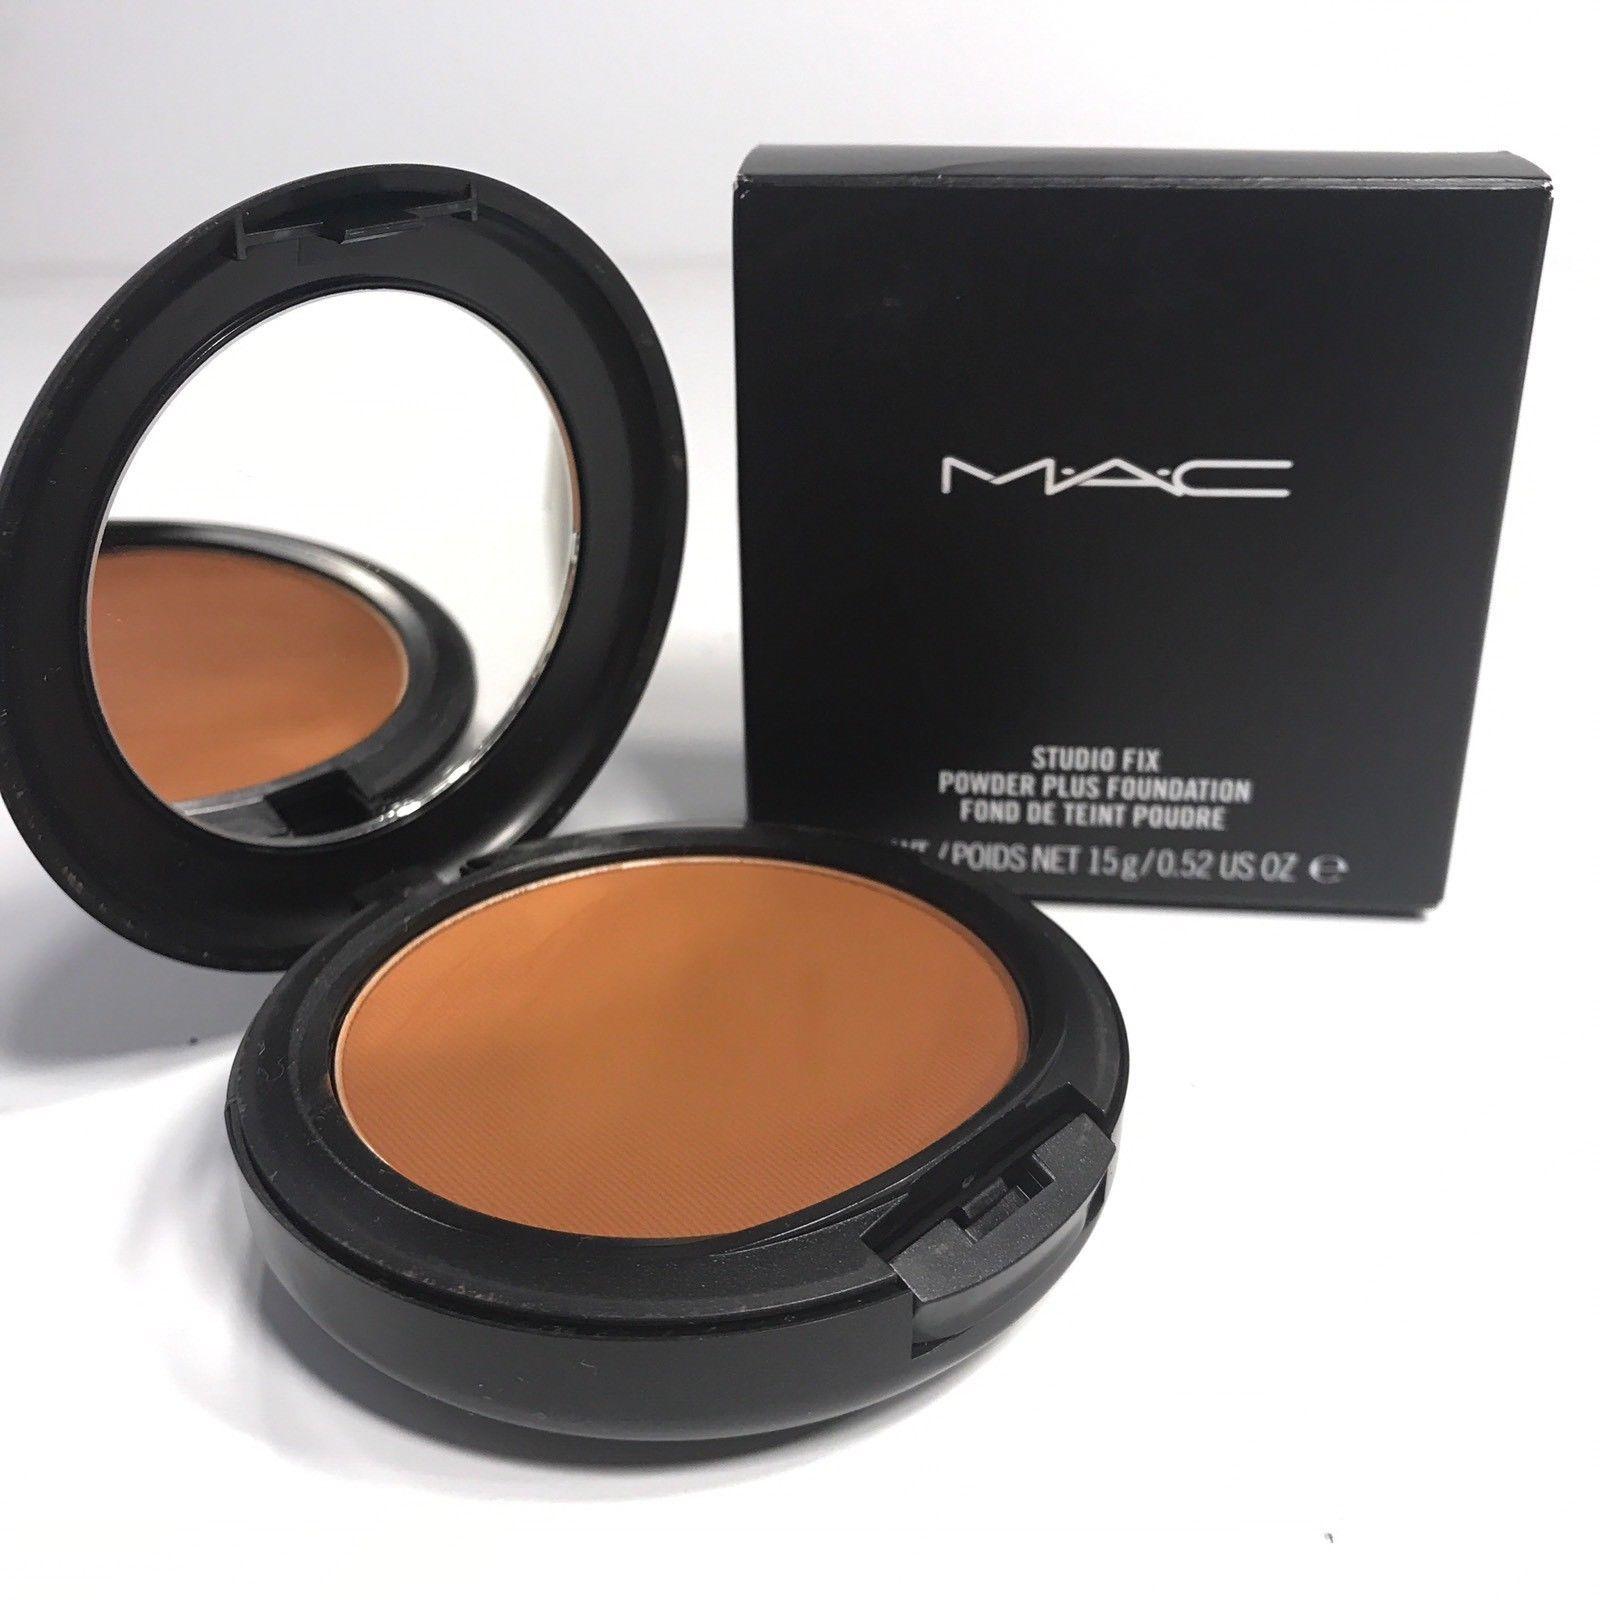 Mac Studio Fix Powder Plus Foundation Nw55 And 50 Similar Items Full Size New In Box 15g